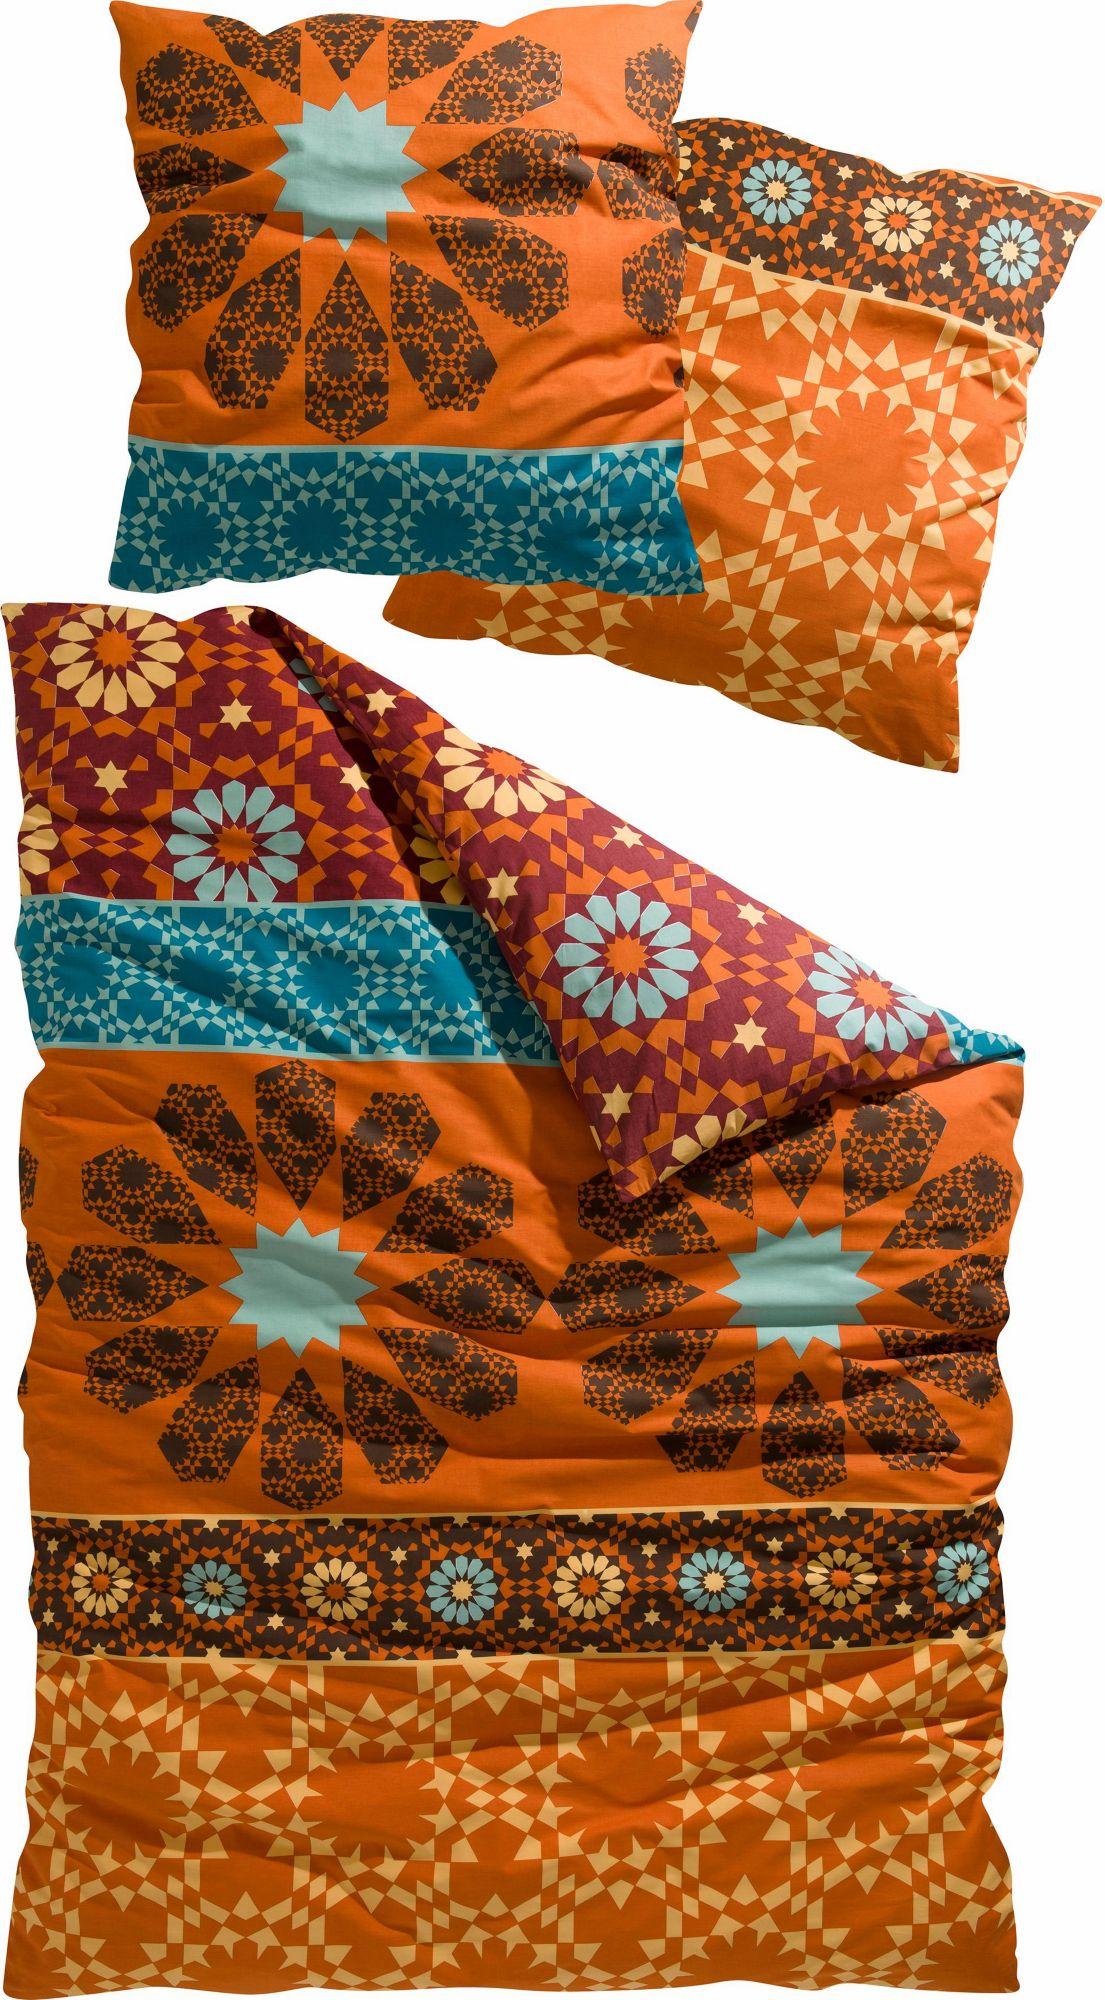 CASATEX Bettwäsche, , »Marrakesch«, mit abstrakten Blüten